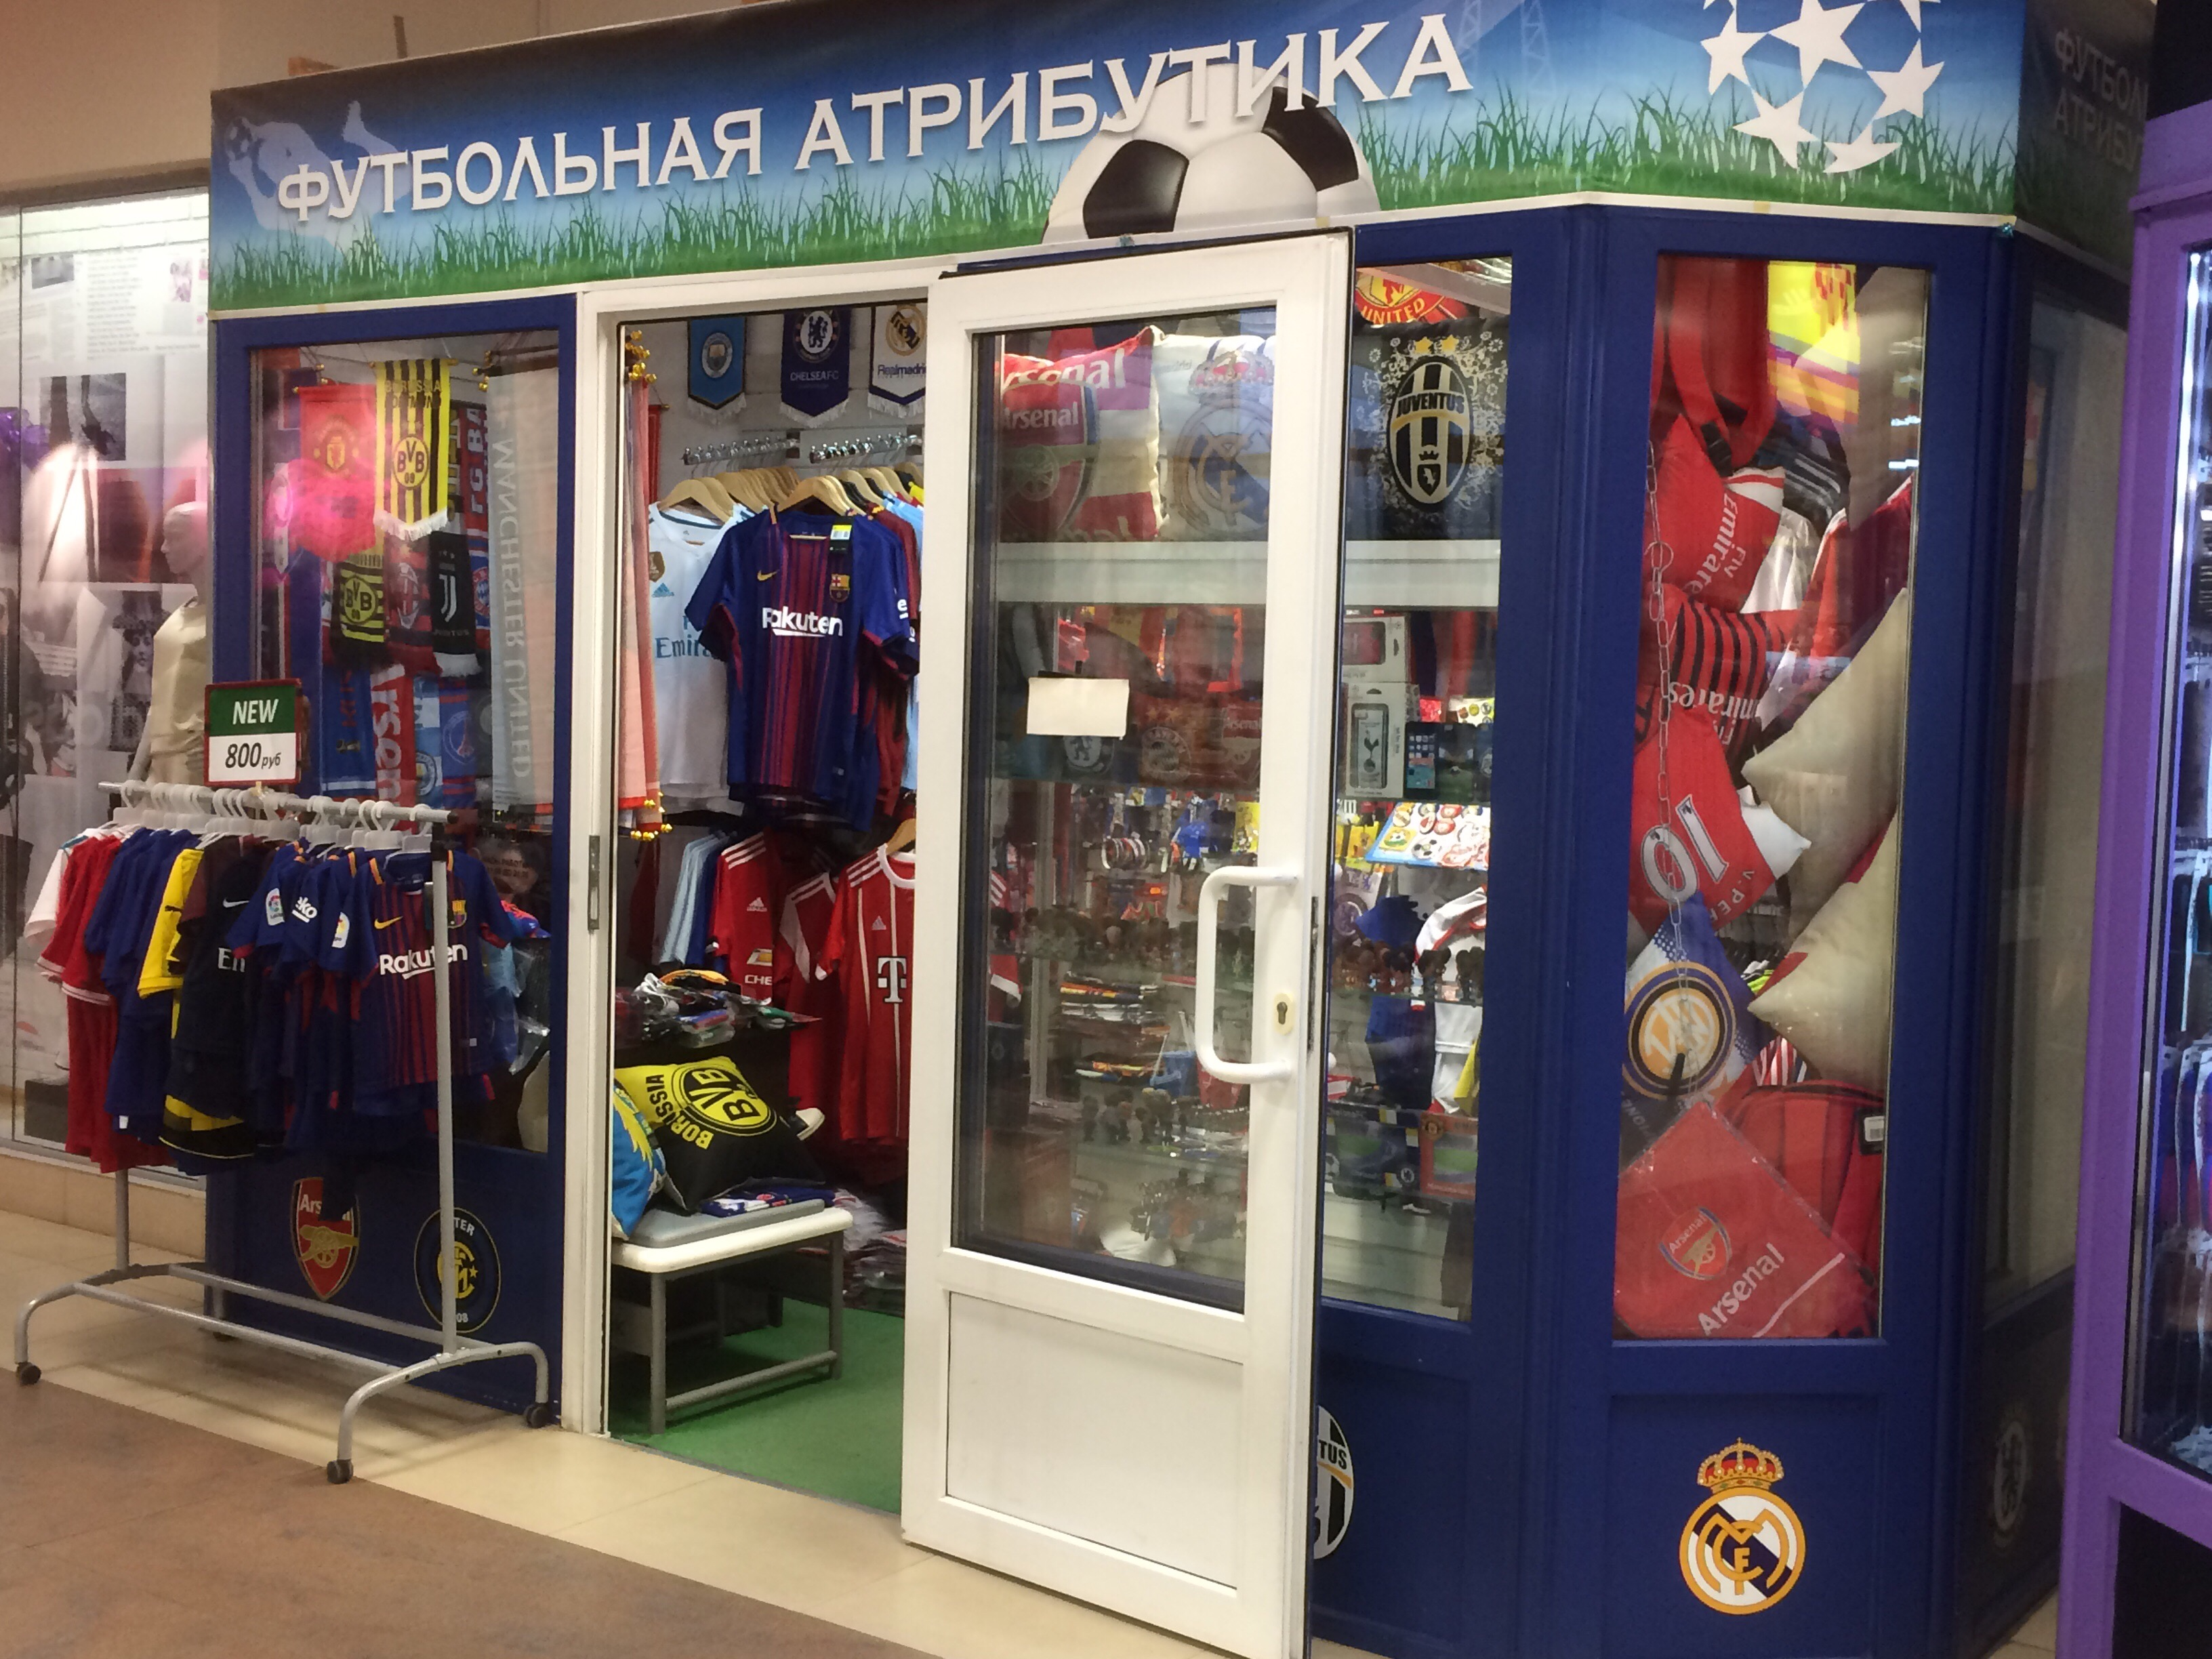 Magazin futbolnoy atributiki, sports apparel, Russia, Krasnodar